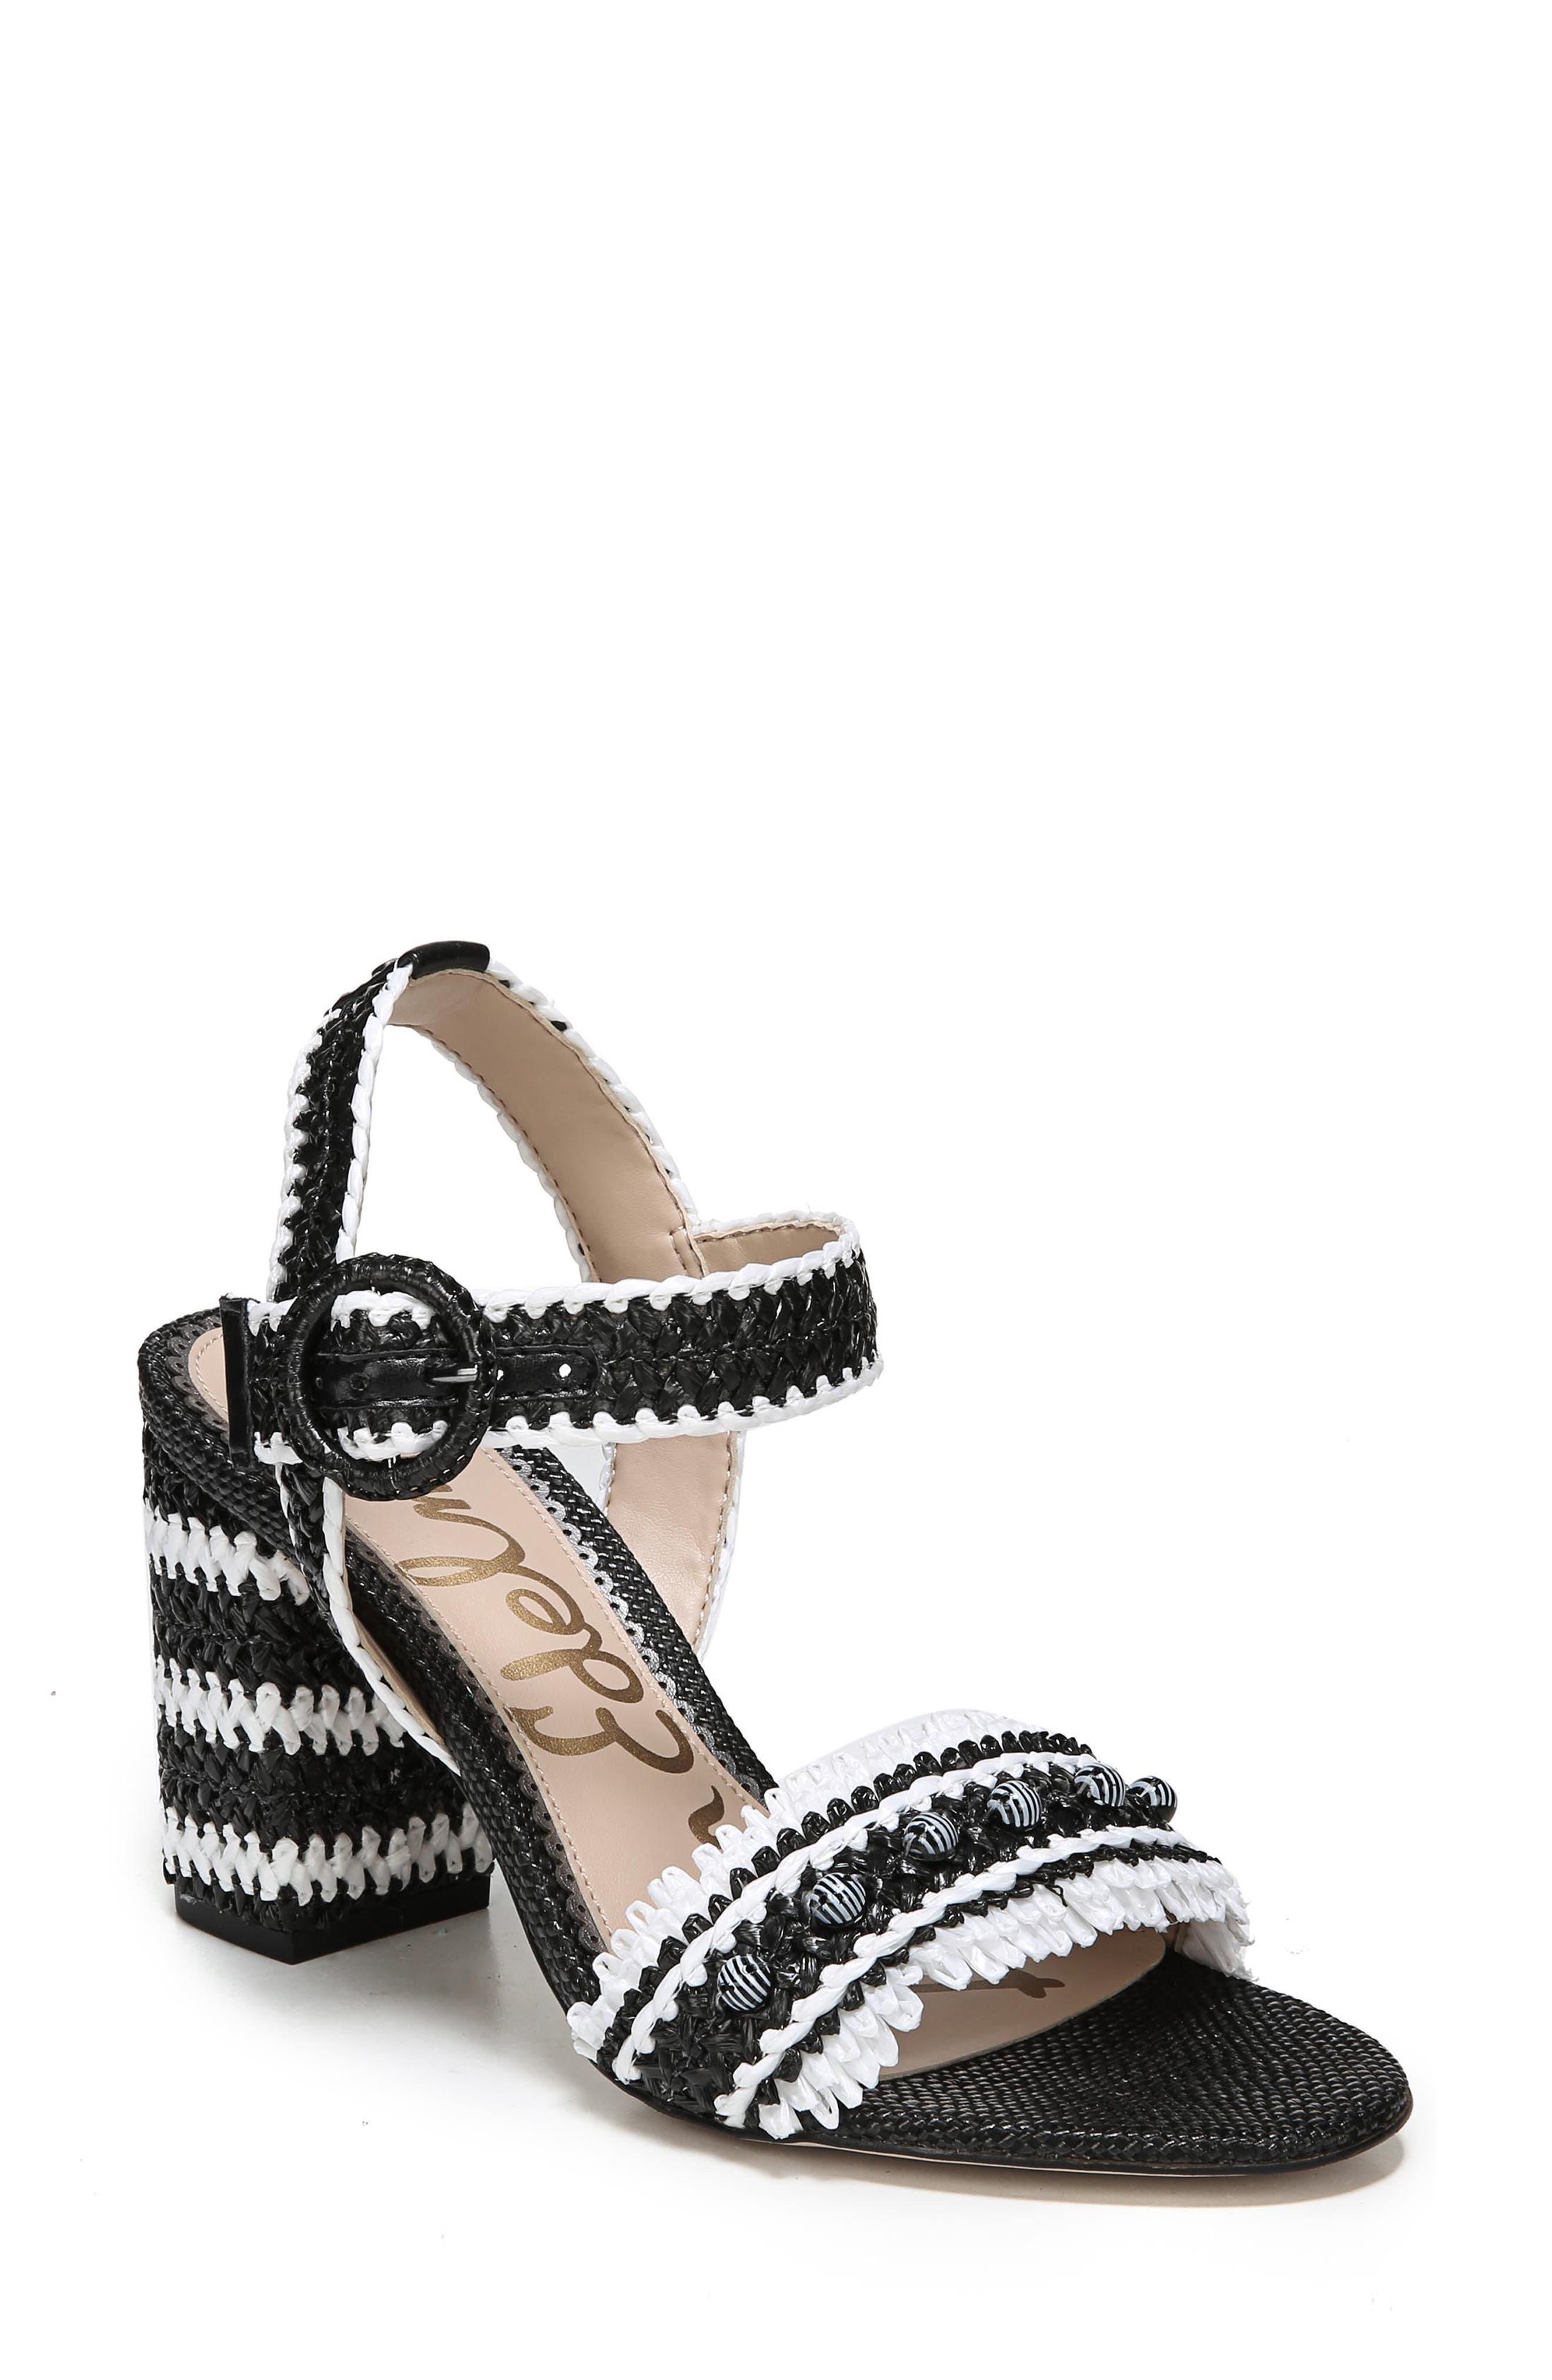 Olisa Block Heel Sandal,                             Main thumbnail 1, color,                             001